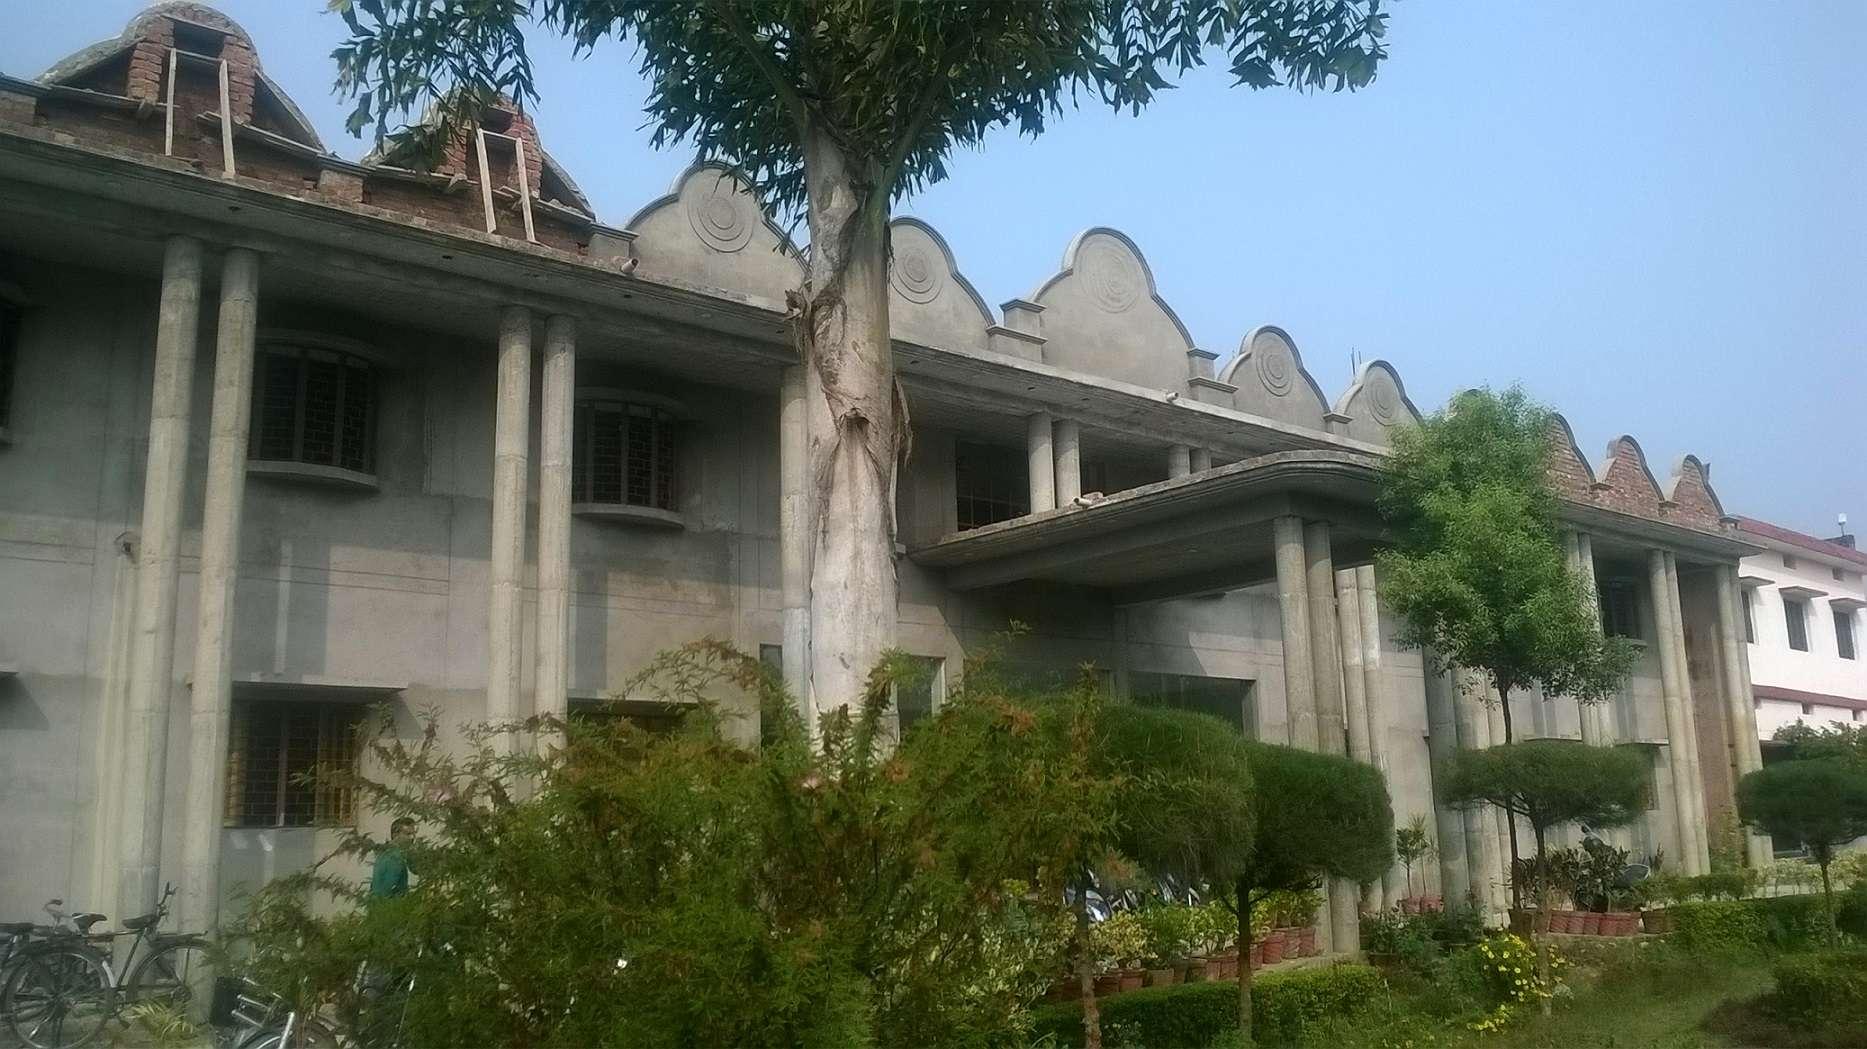 MOTHER S GLORY PUBLIC SCHOOL TANDA RAMNAGAR NAINITAL UTTRAKHAND 3530322